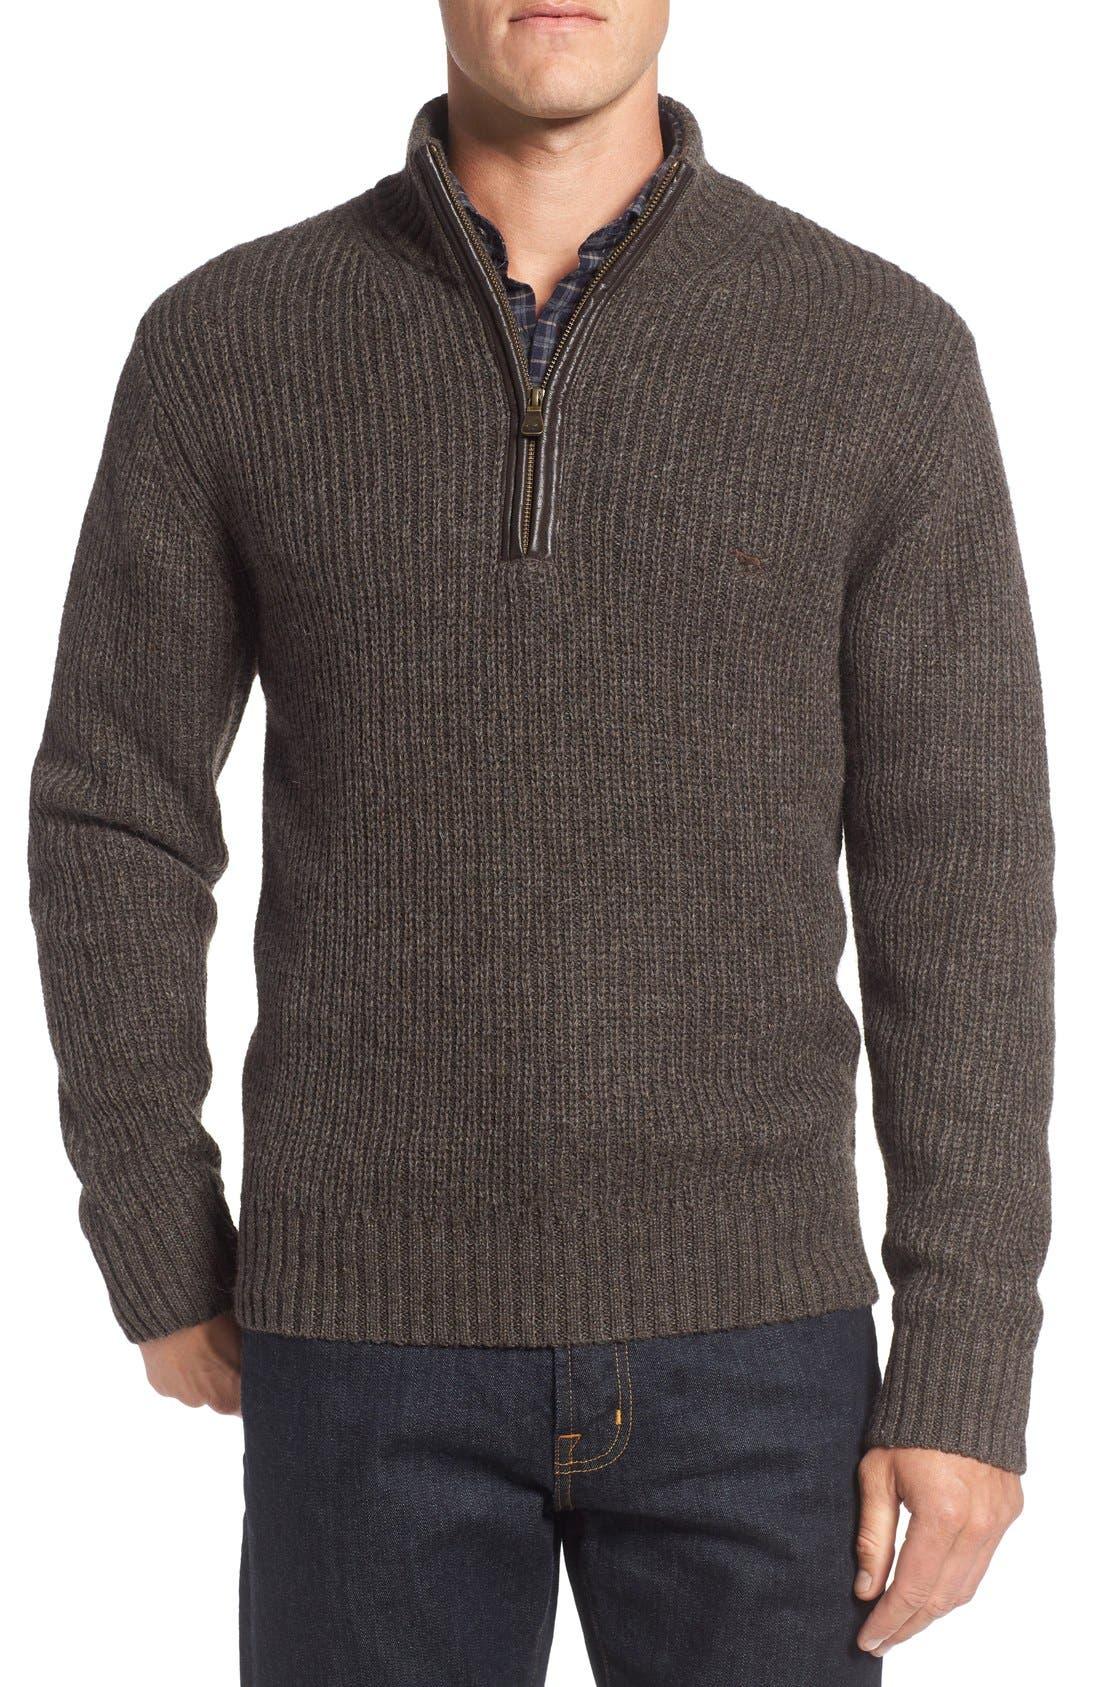 'Huka Lodge' Merino Wool Blend Quarter Zip Sweater,                             Main thumbnail 1, color,                             Dirt